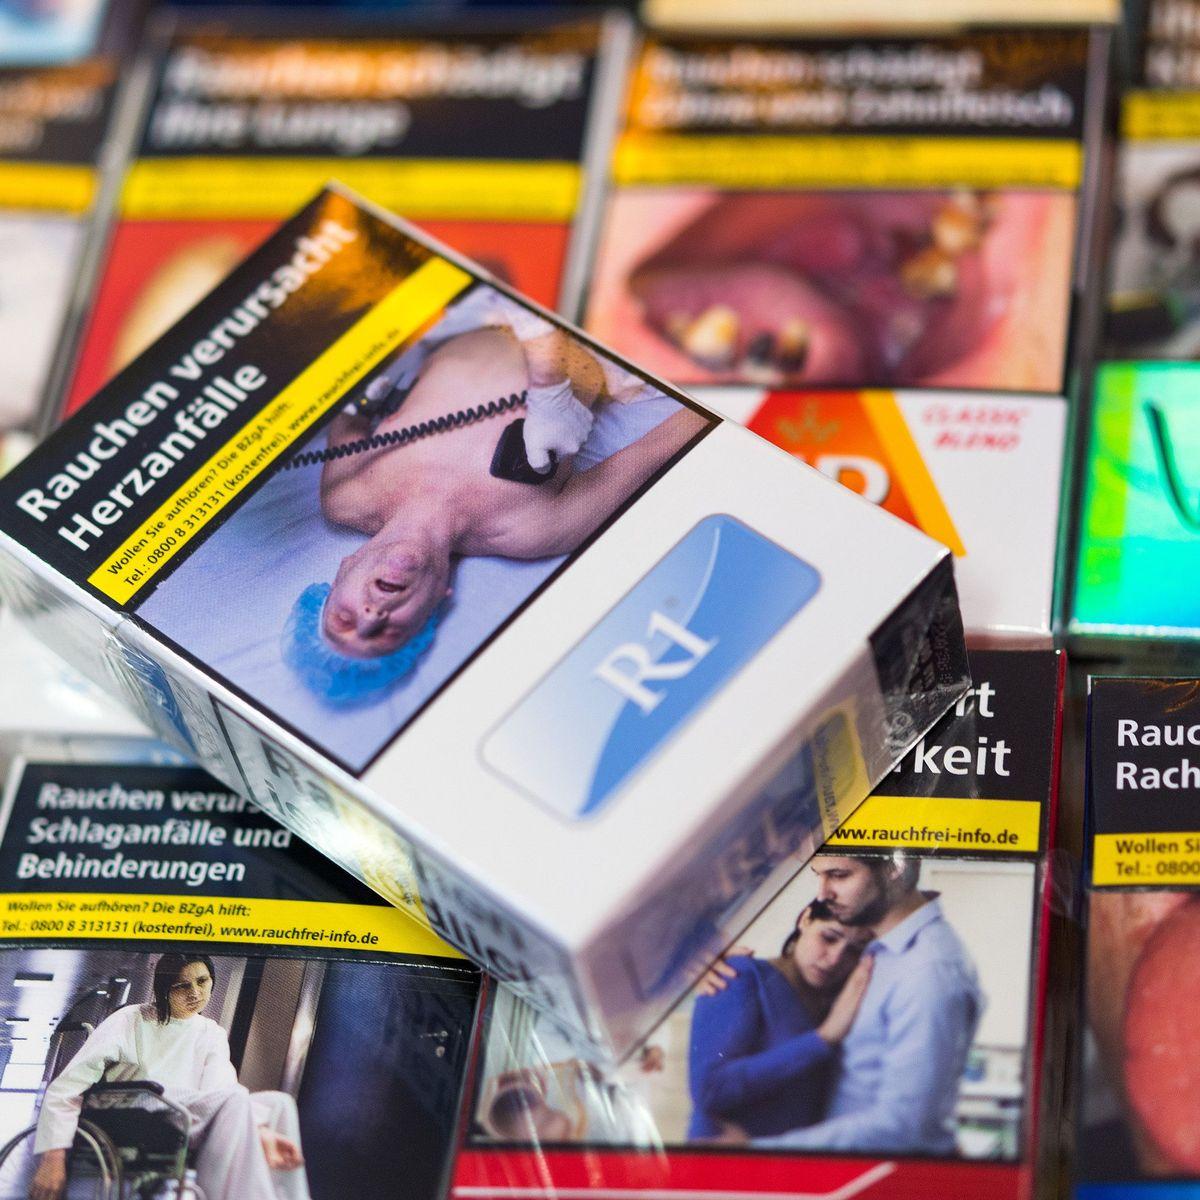 vogue zigaretten preis pro packung